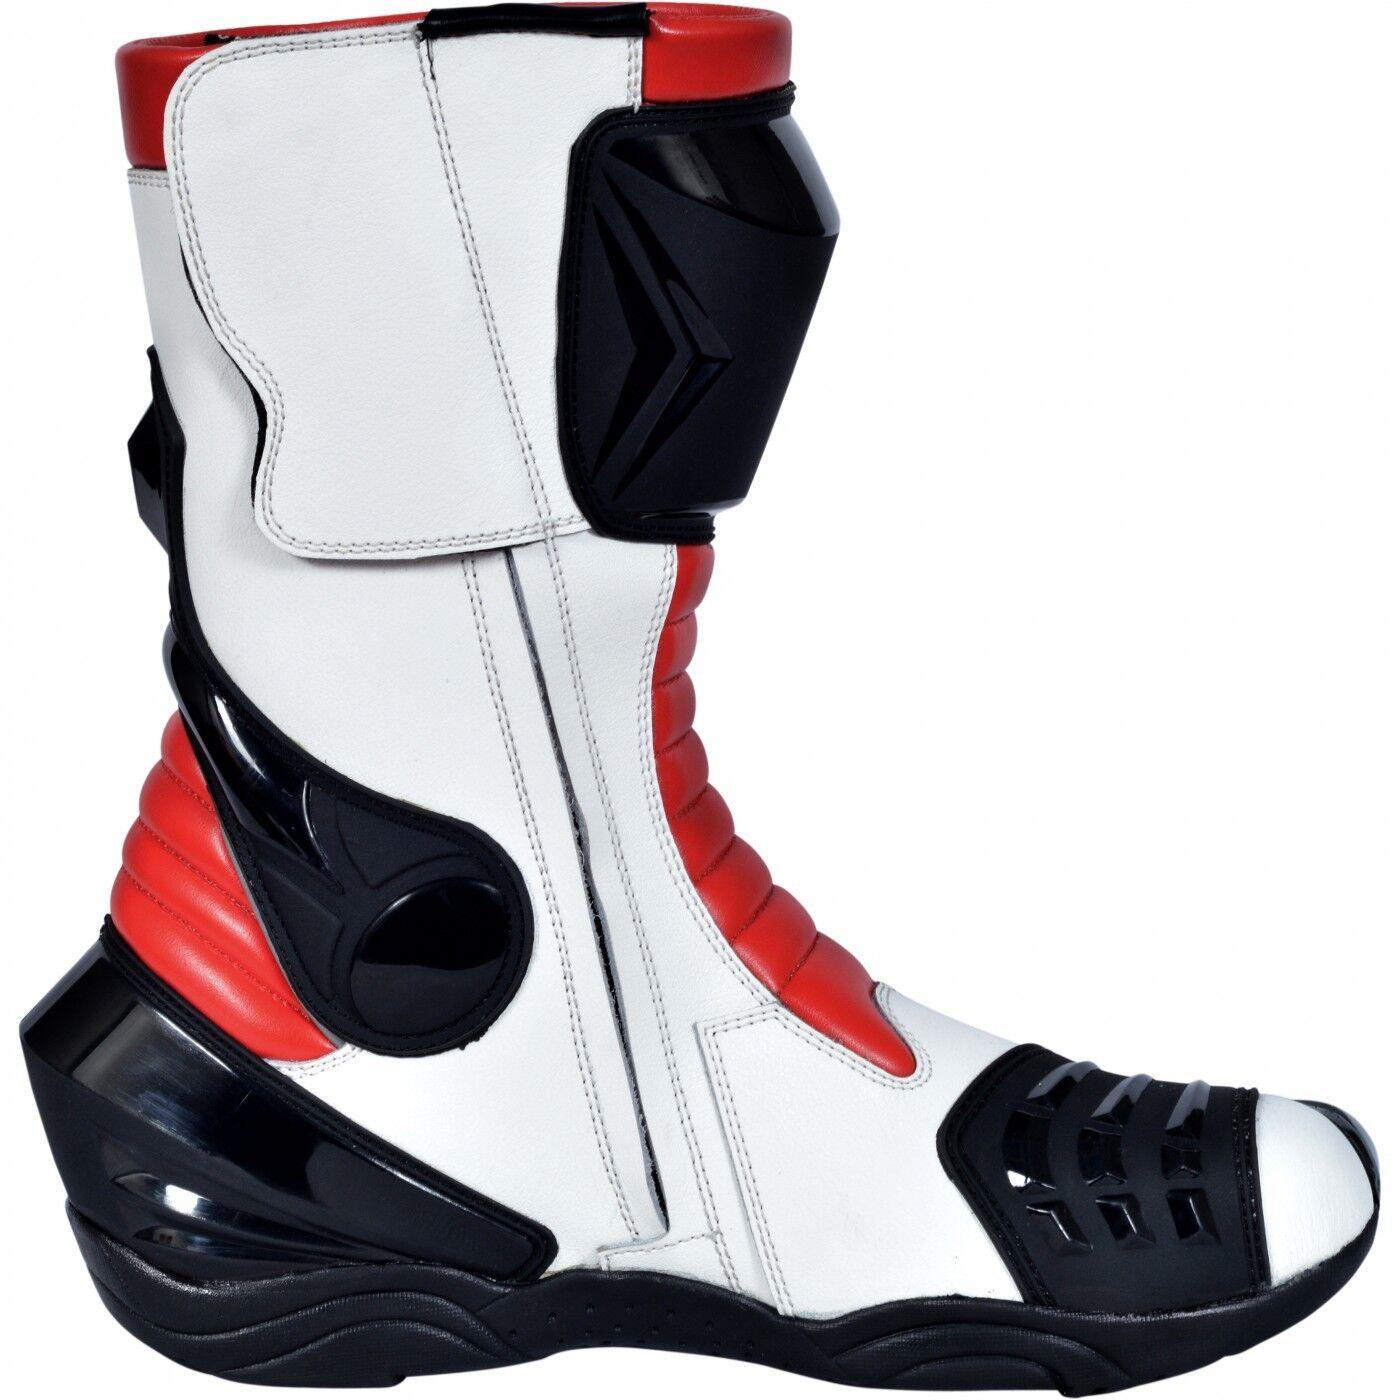 German wear, Biker Moto Stivali Moto Sport Touring Stivali Bianco Rosso 32cm